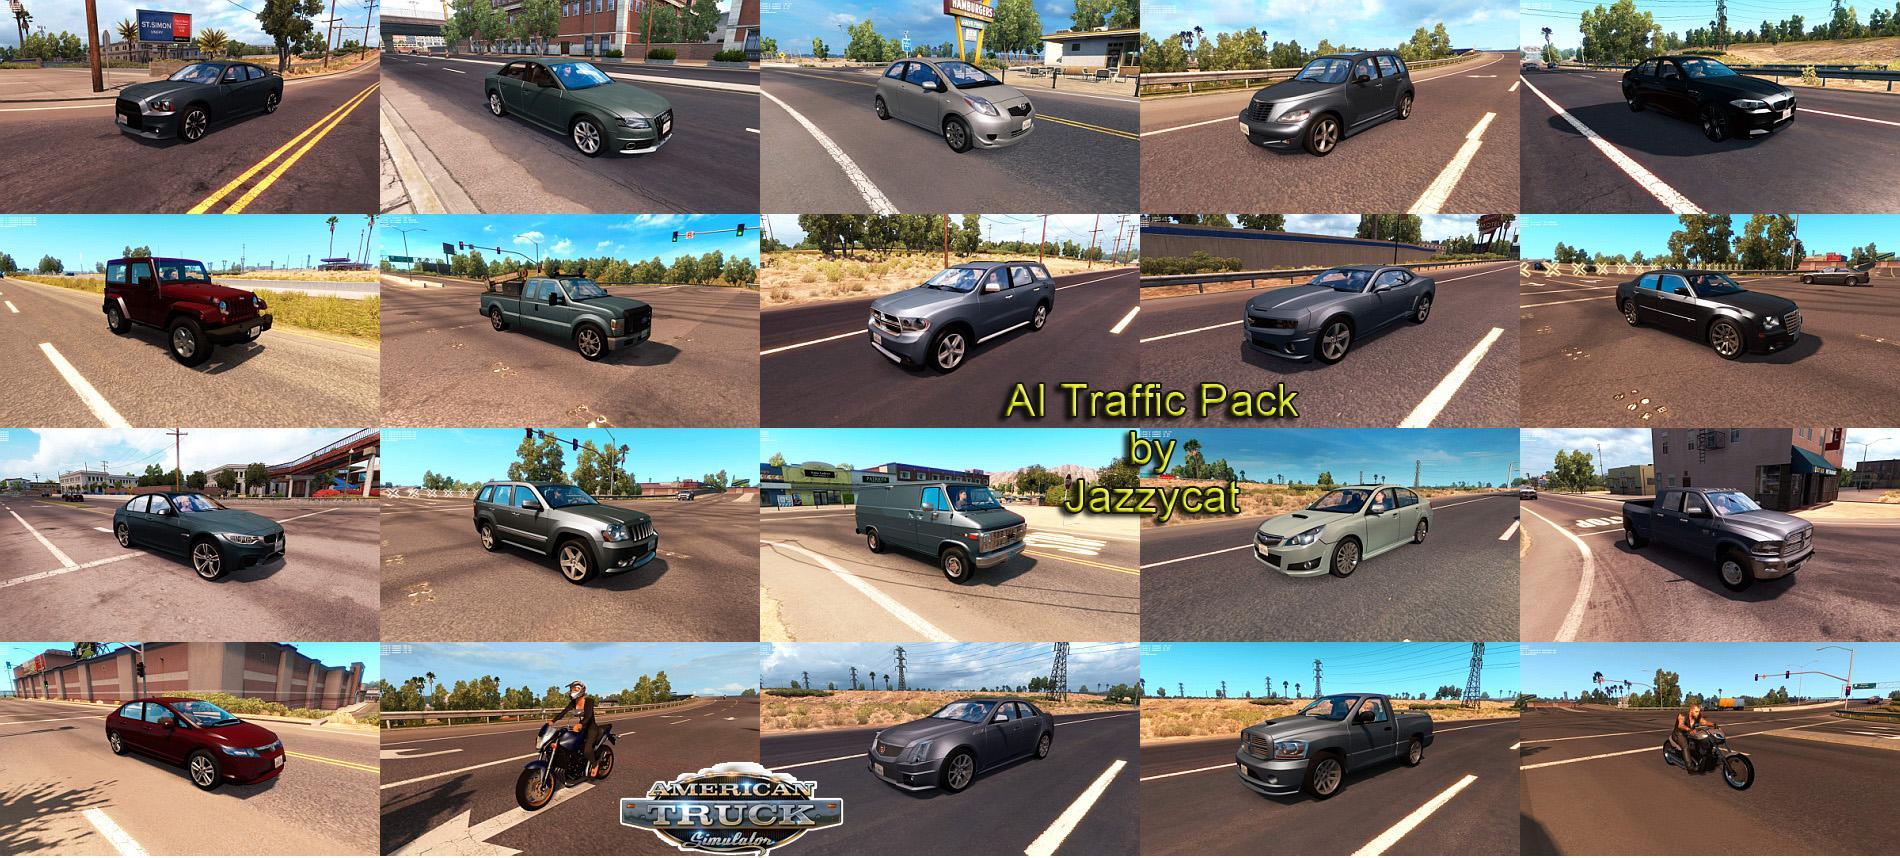 AI TRAFFIC PACK BY JAZZYCAT V1 5 - American Truck Simulator